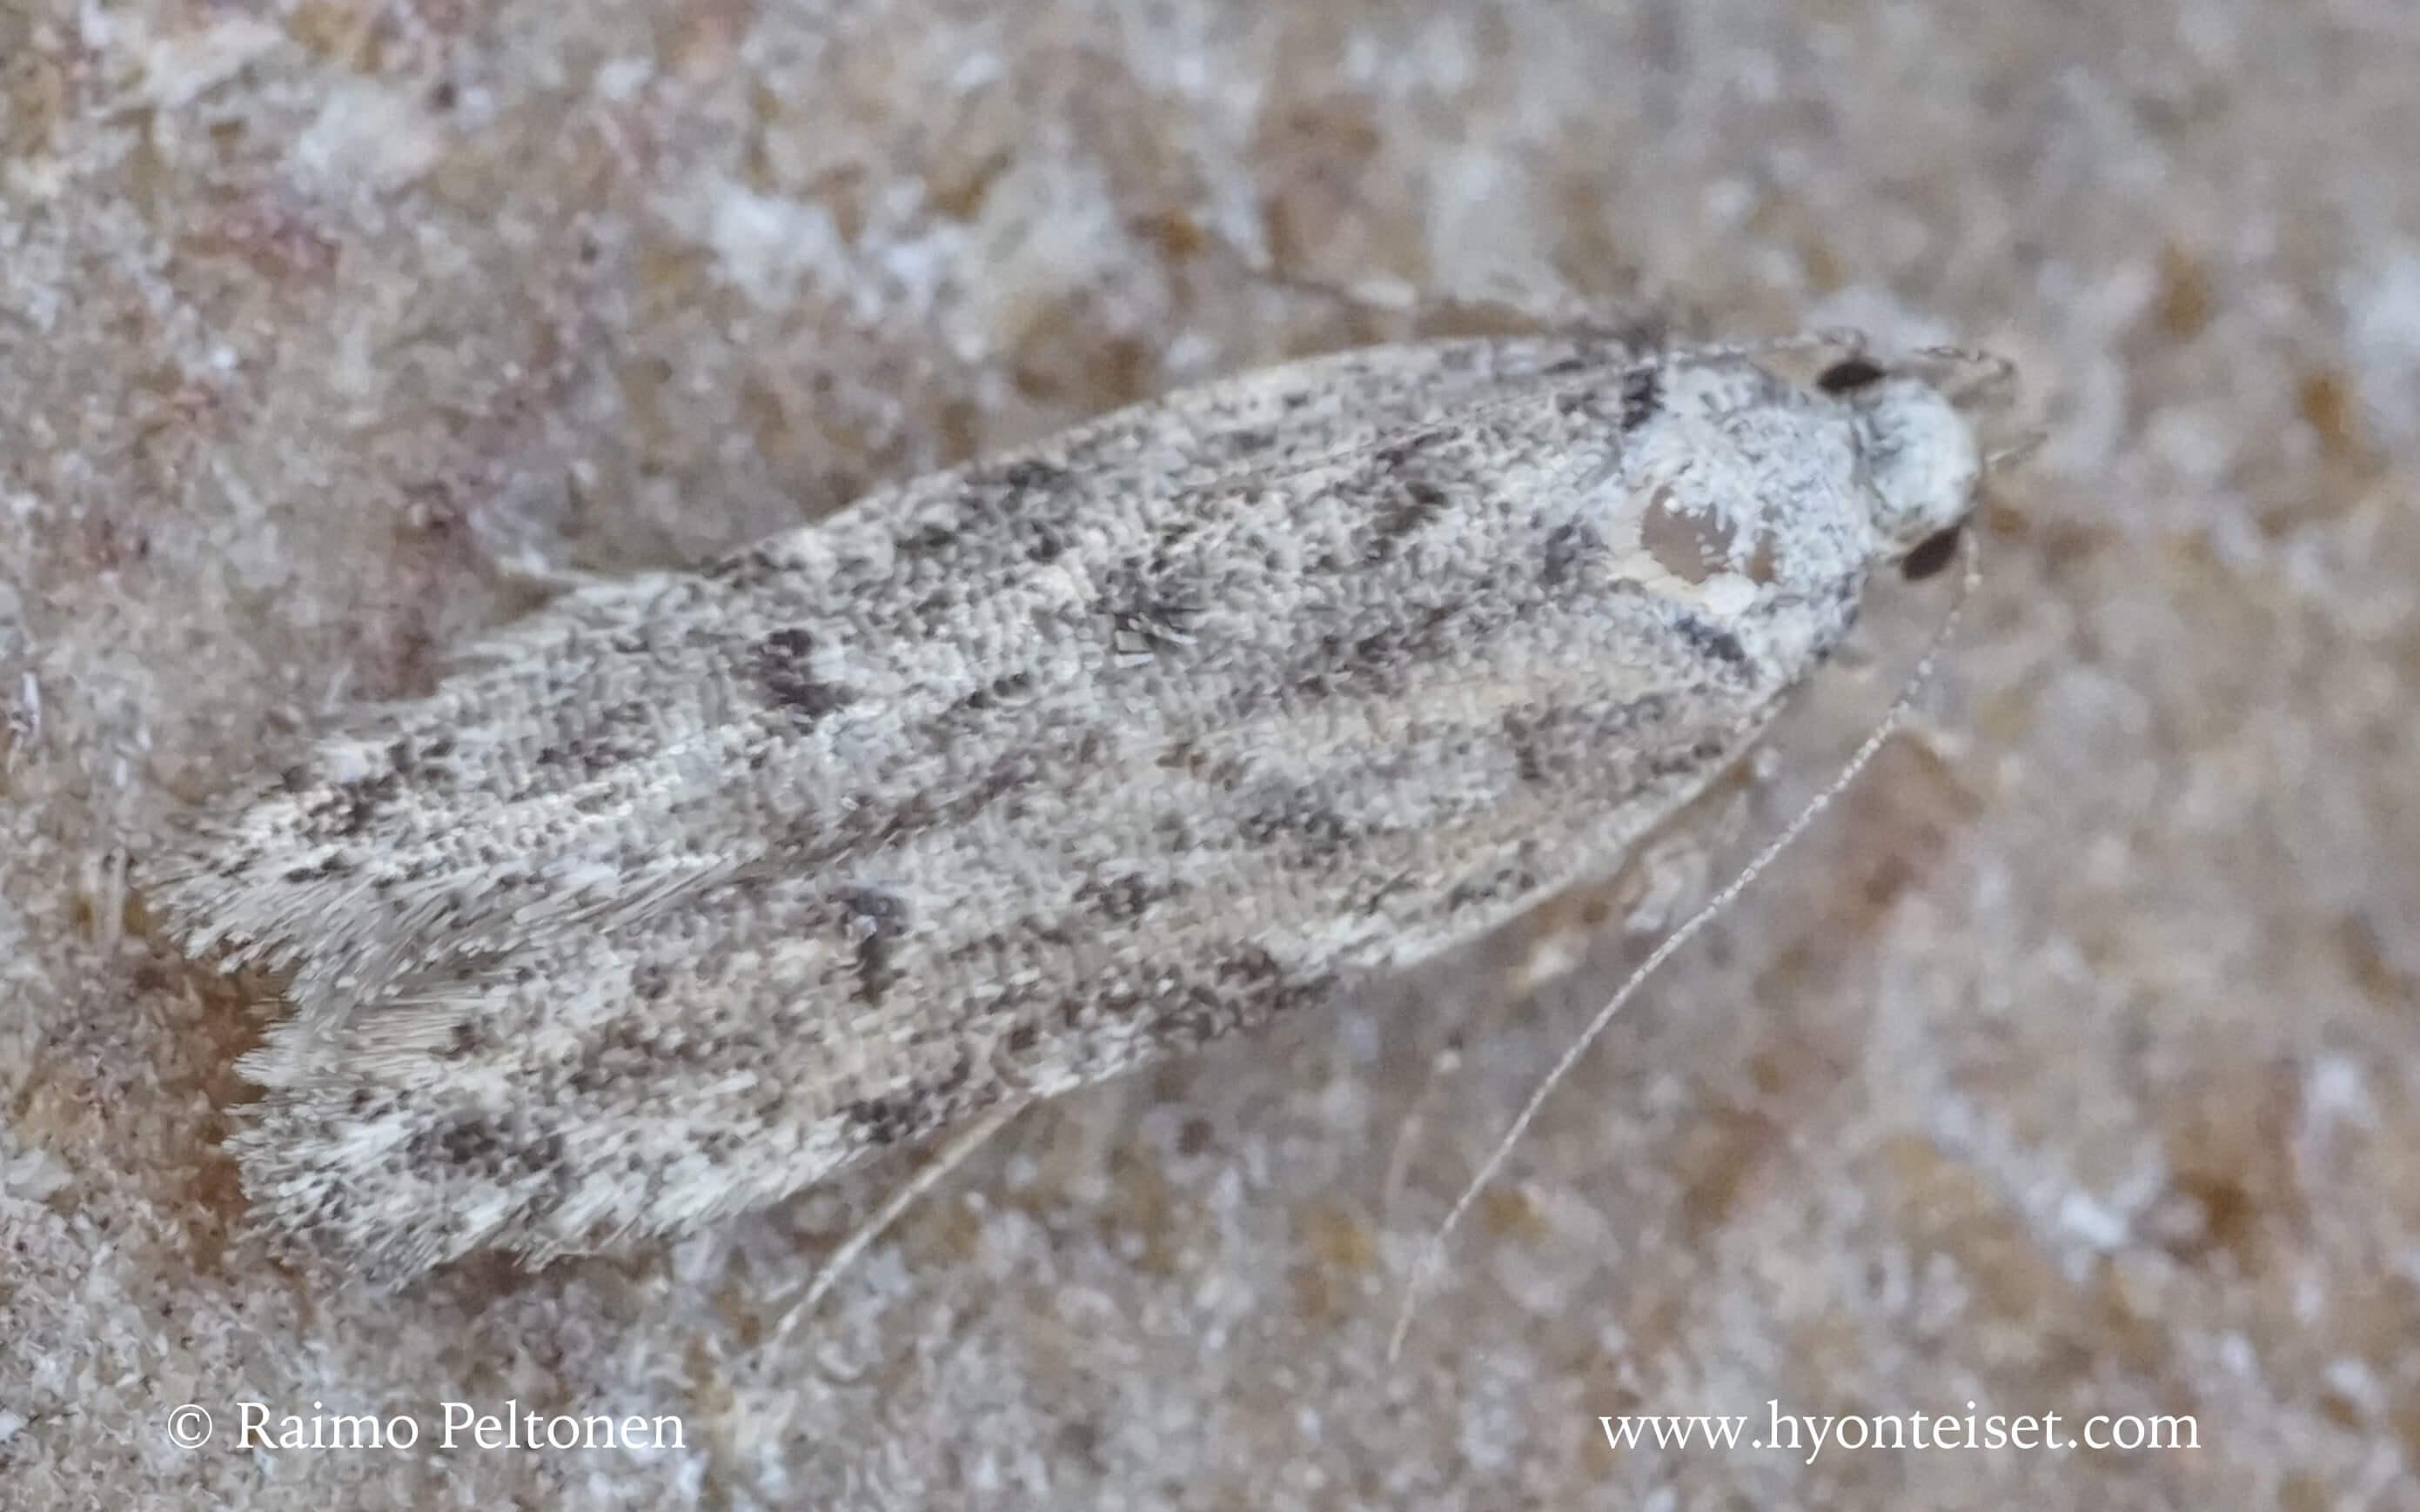 Psoricoptera speciosella (det. Harri Jalava)